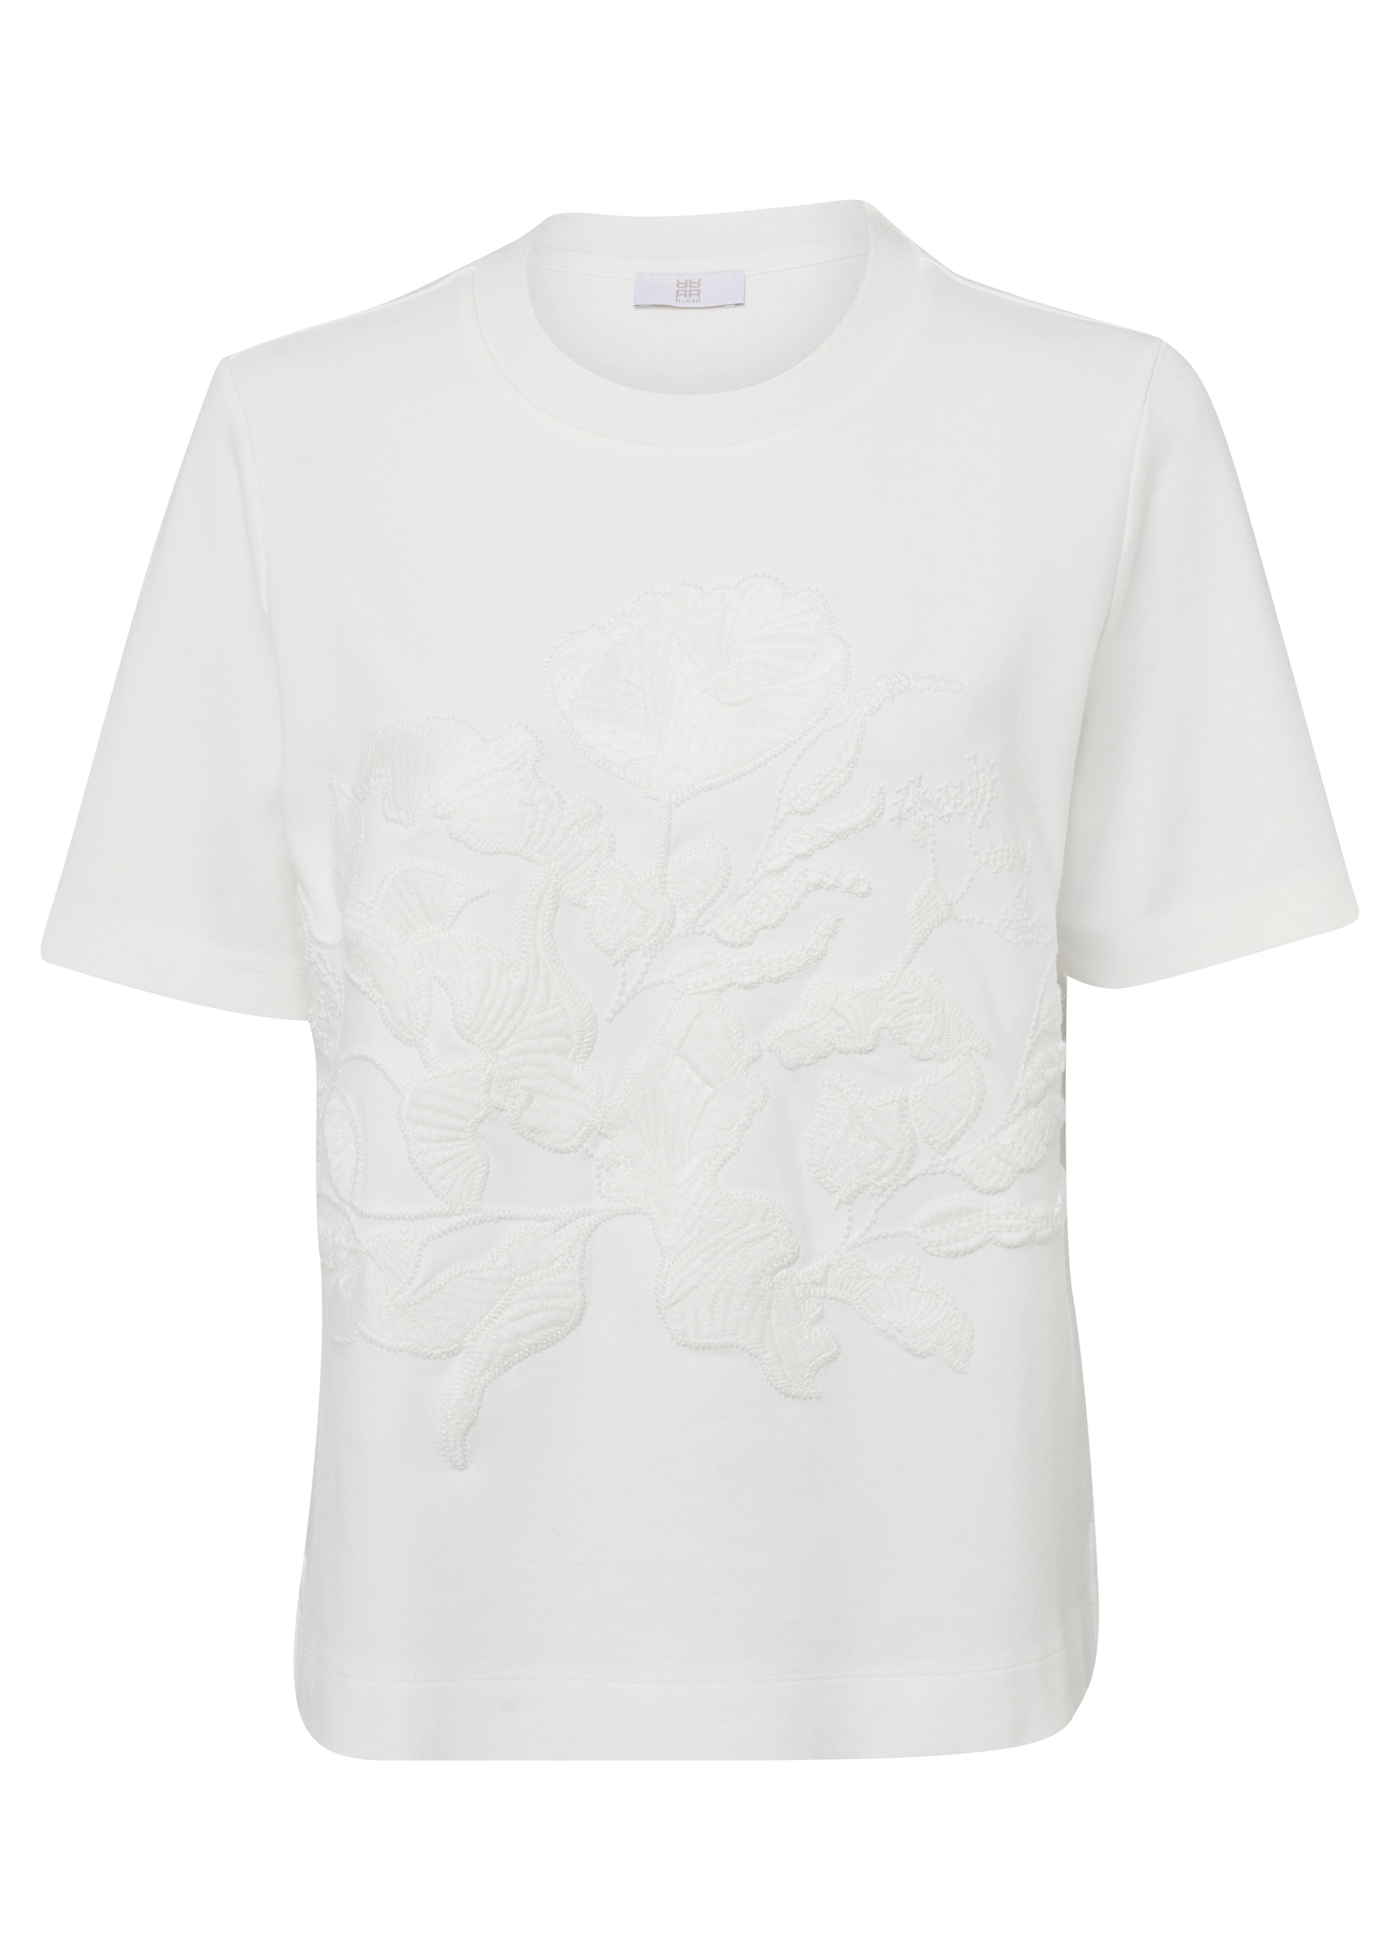 Jersey sweat shirt image number 0